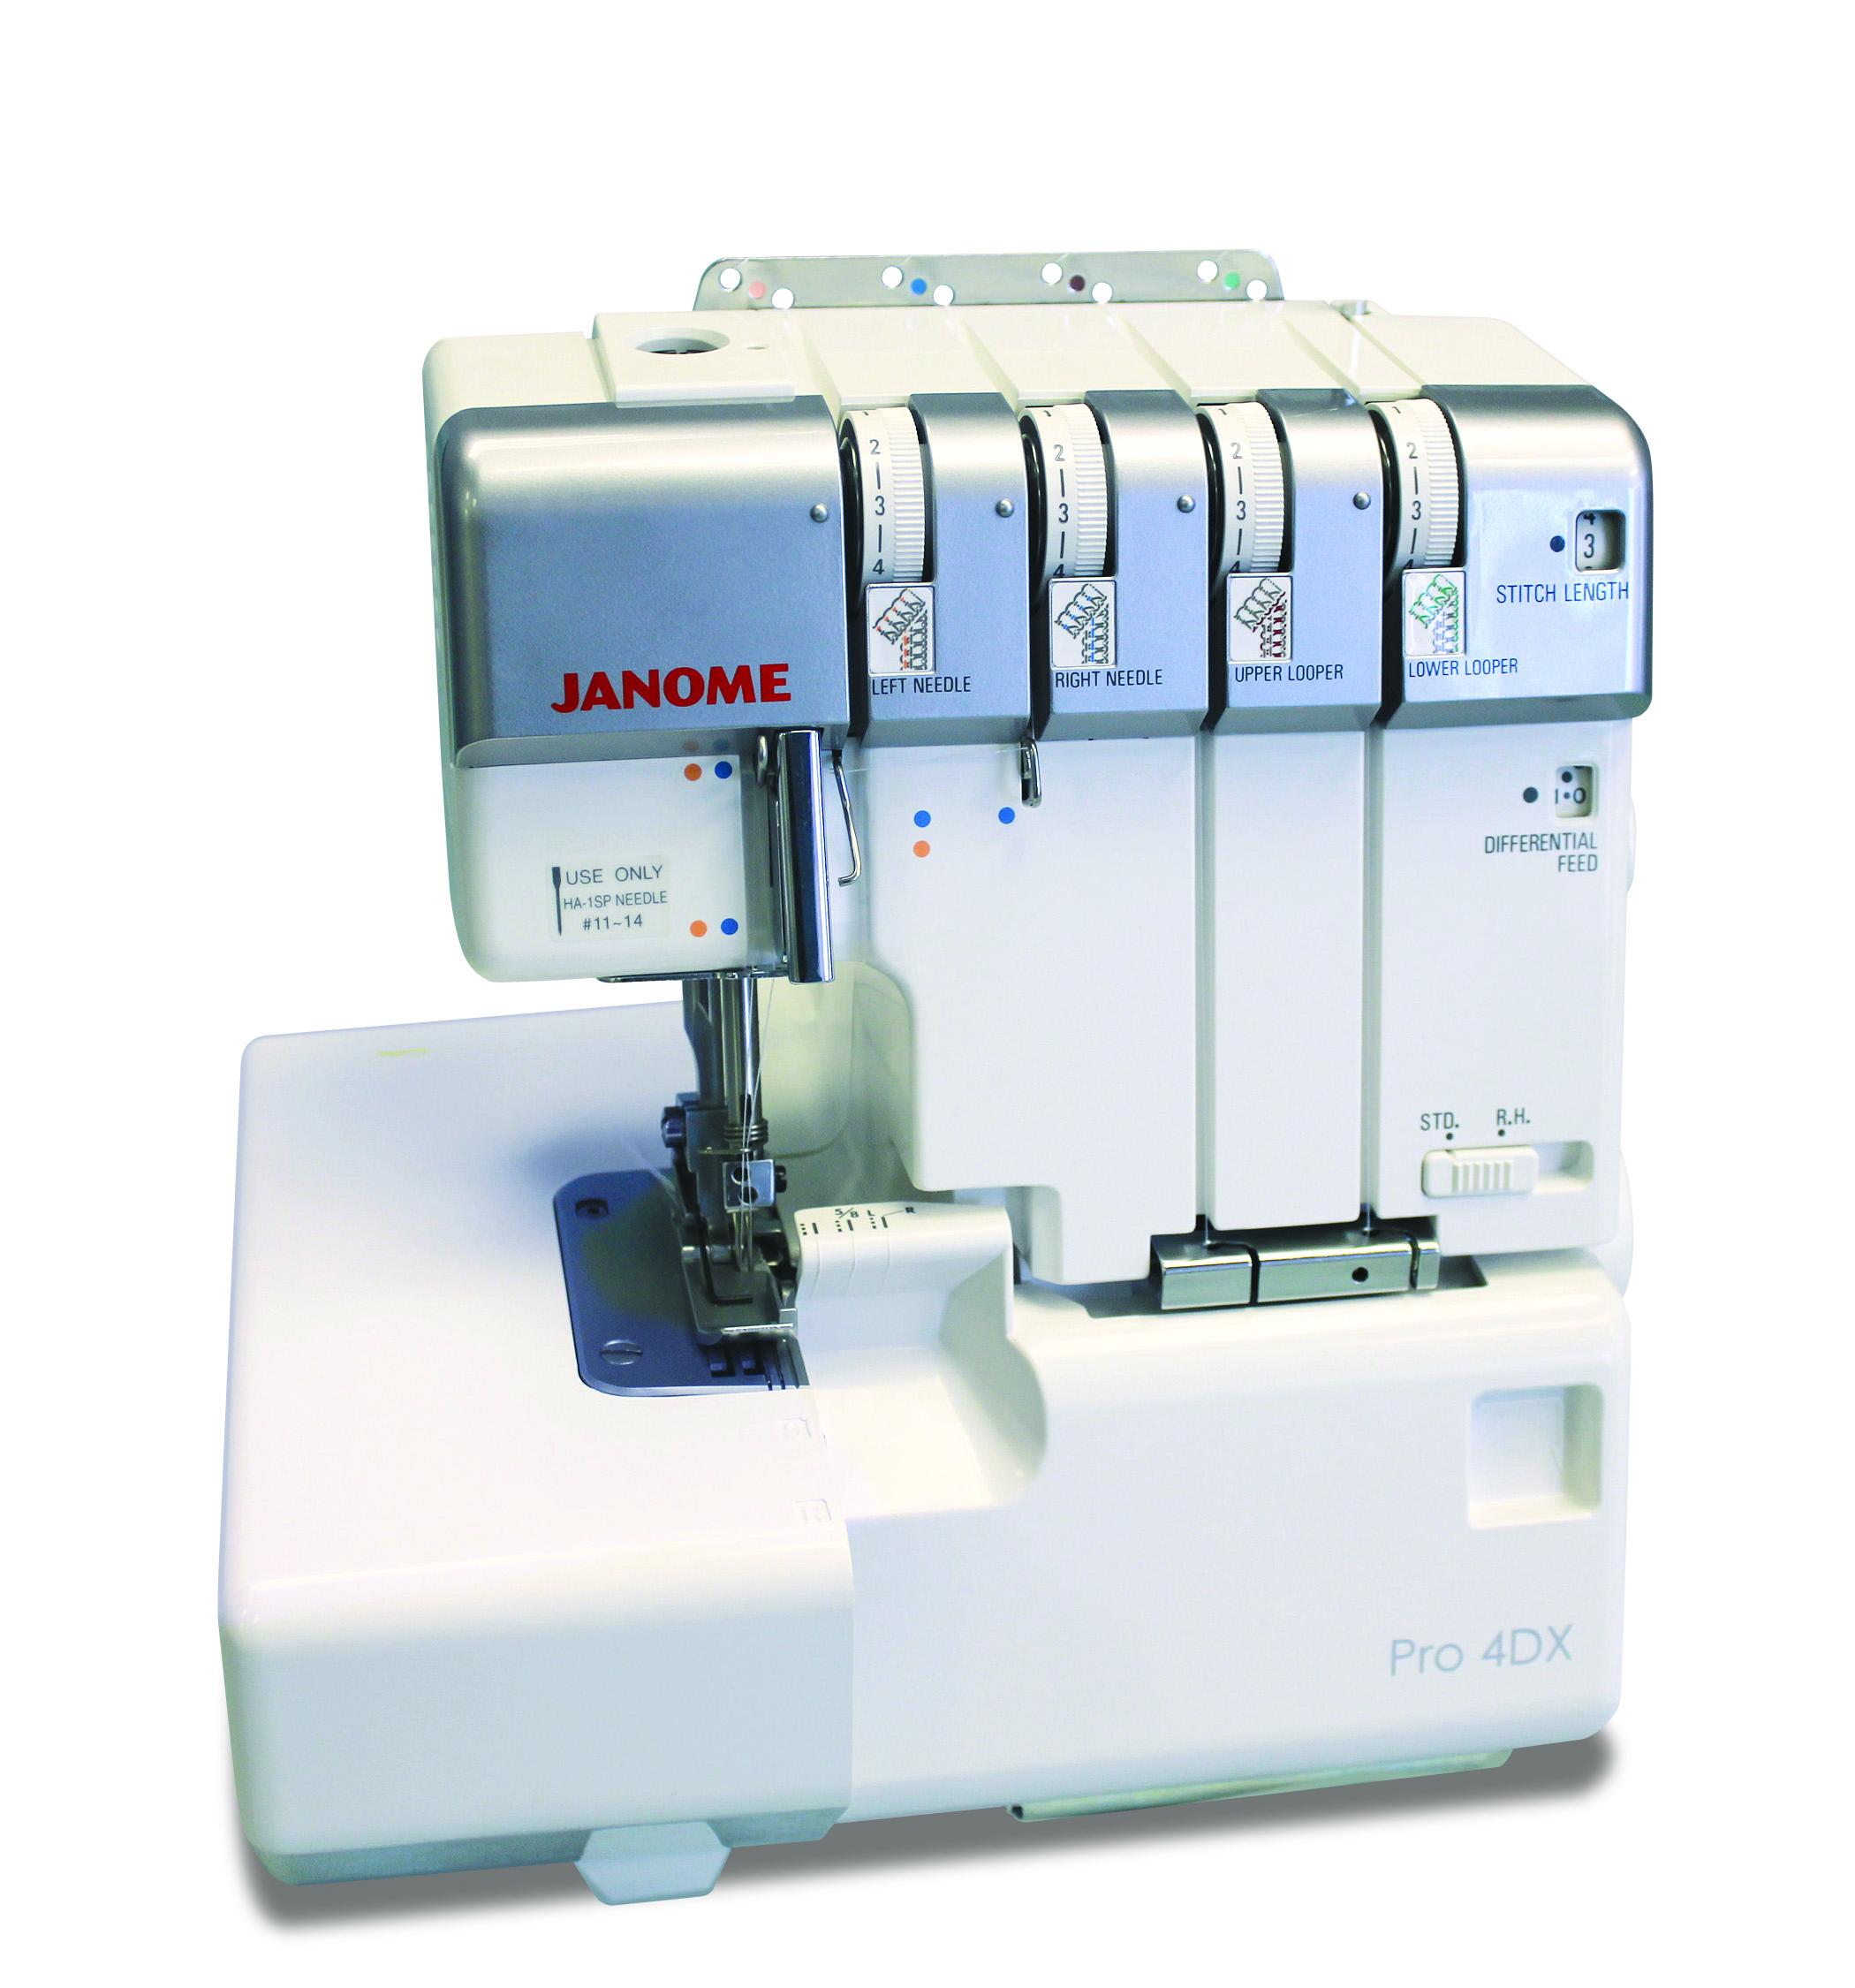 quilt p quilting main craft machine memory janome new htm shop web c